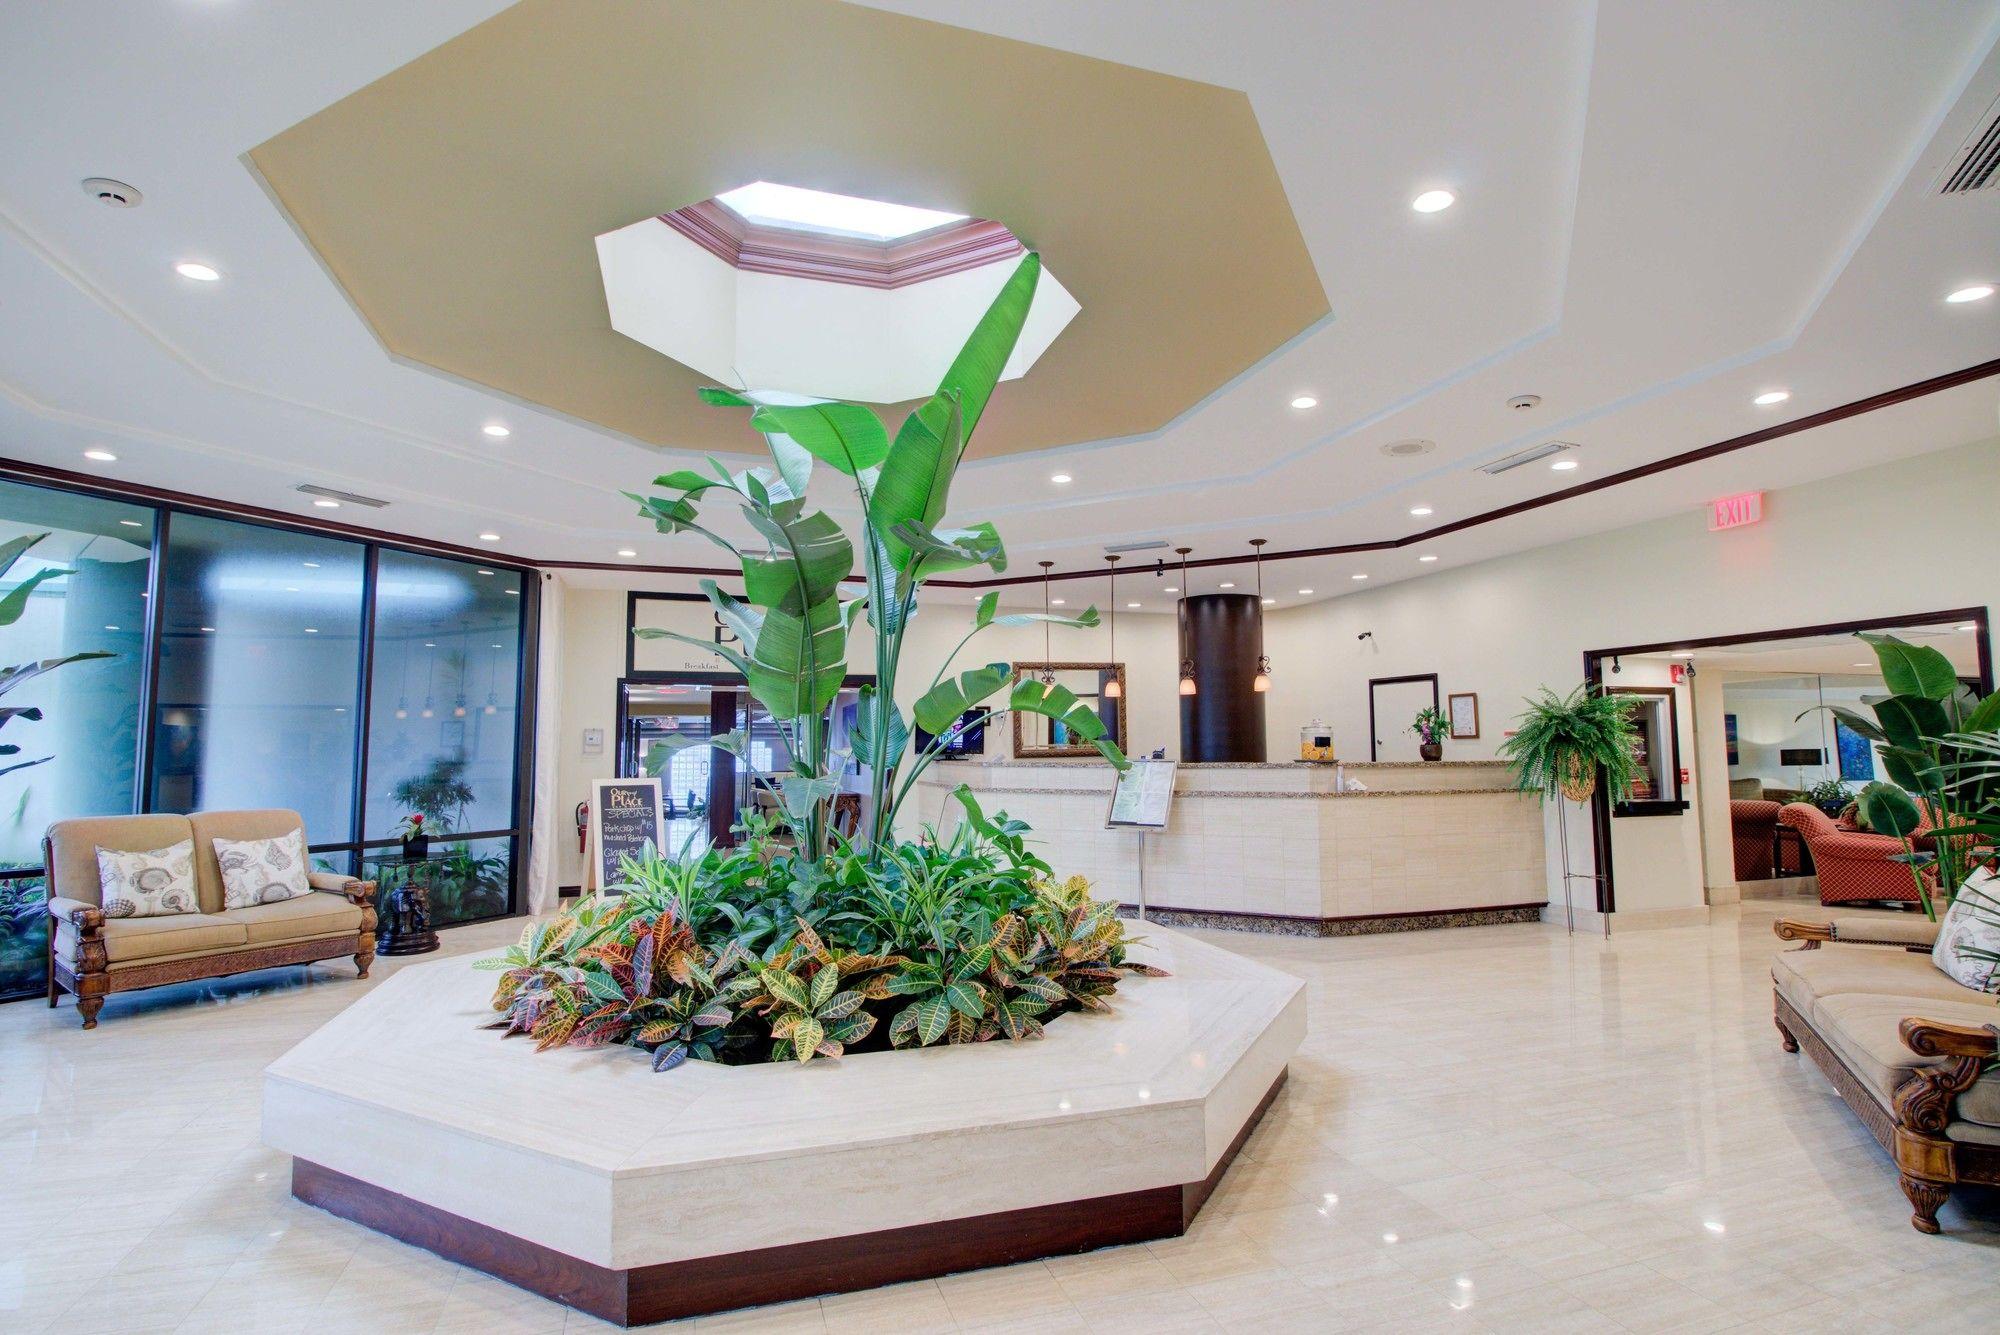 Boca Raton Plaza Hotel Suites in Boca Raton, FL